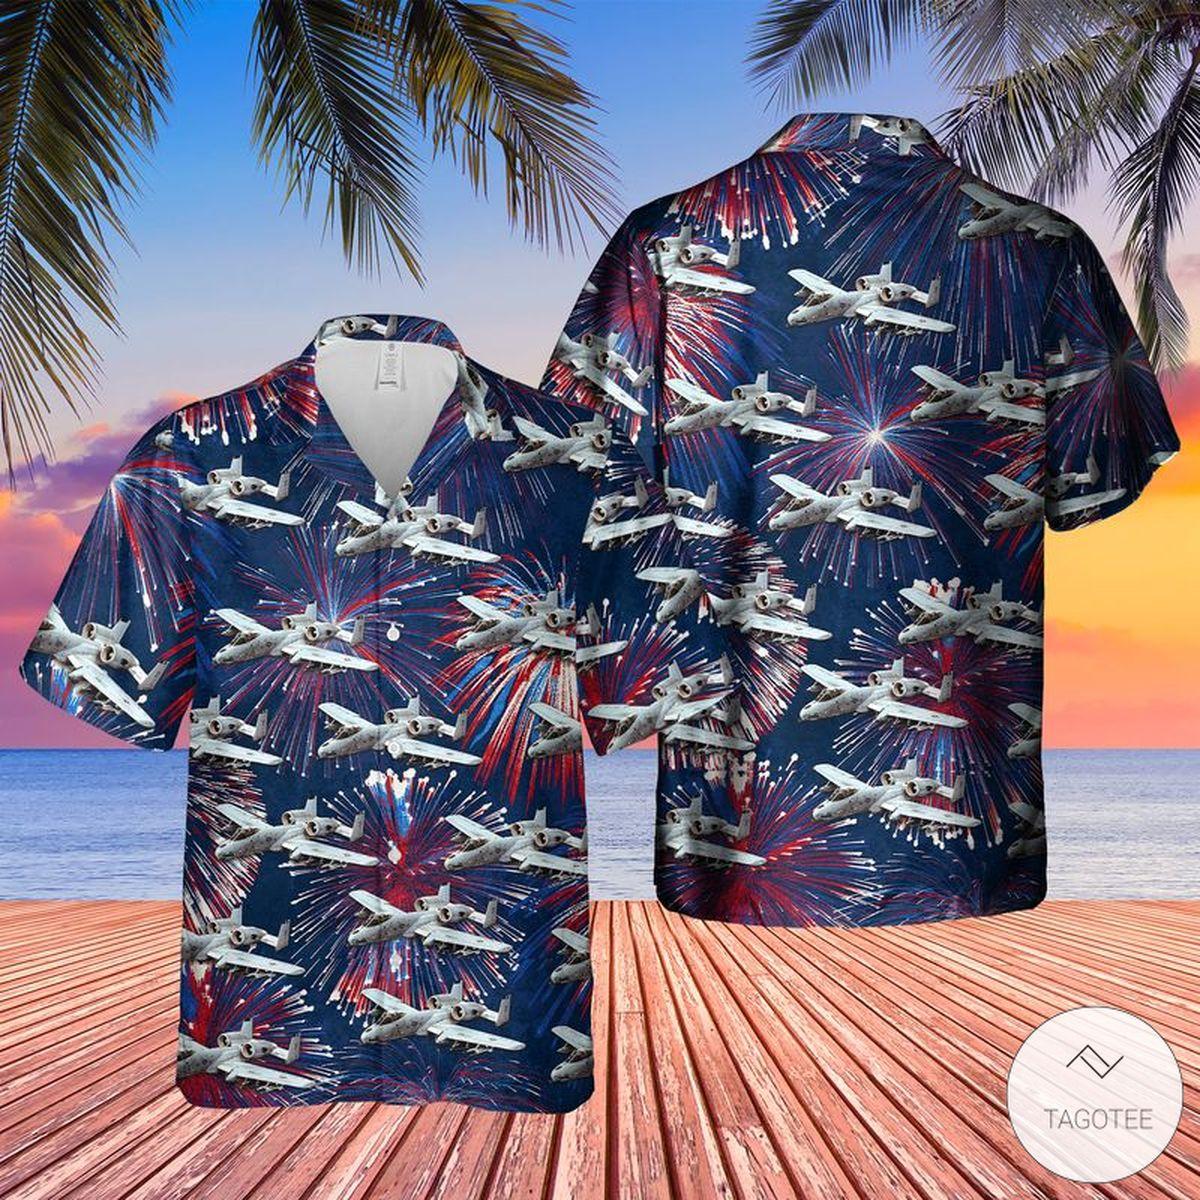 Funny Tee US Air Force Fairchild Republic A-10 Thunderbolt II 4th Of July Hawaiian Shirt